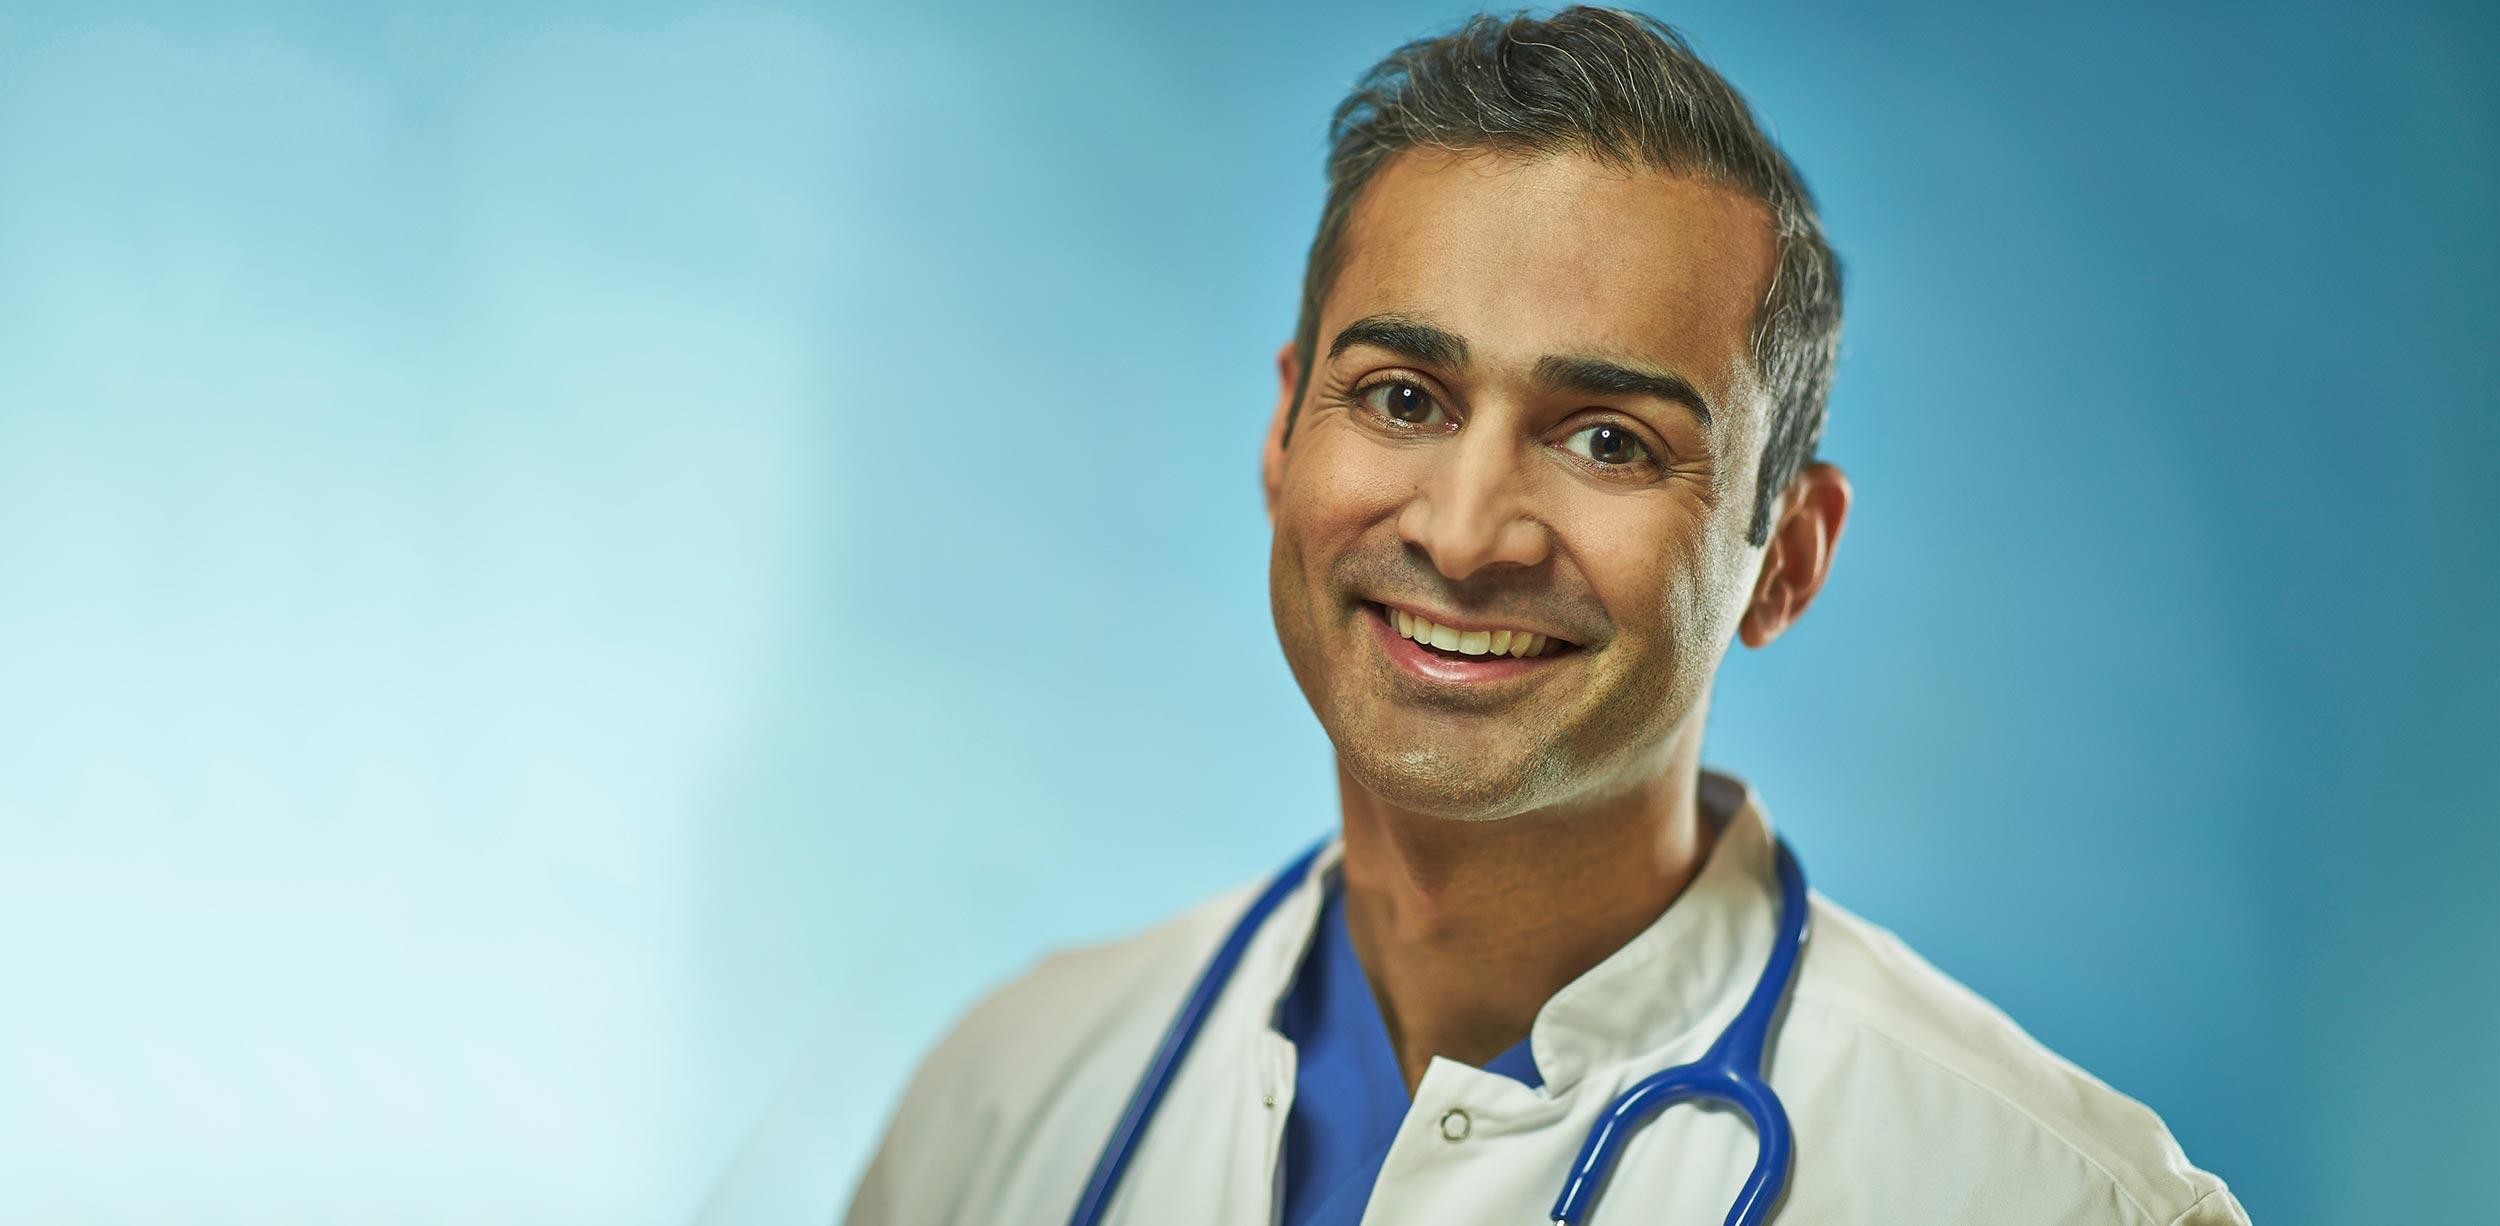 Dr-Susheel-Saini